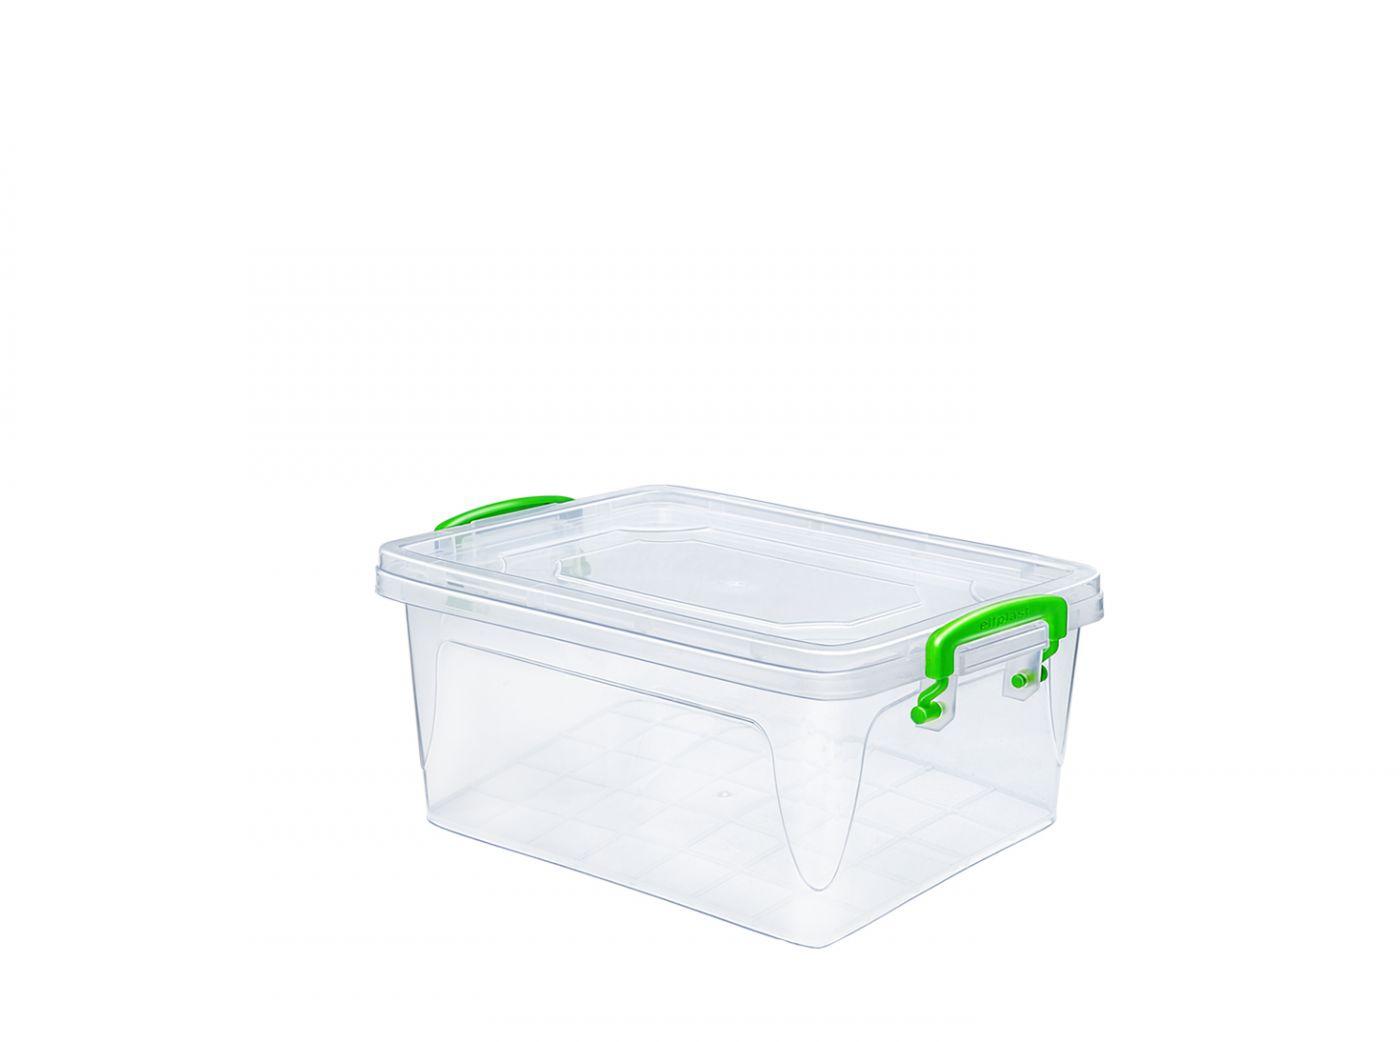 Контейнер для хранения Эльфпласт Fresh Box 1 литр прозрачный с крышкой 17х11х9,8 см